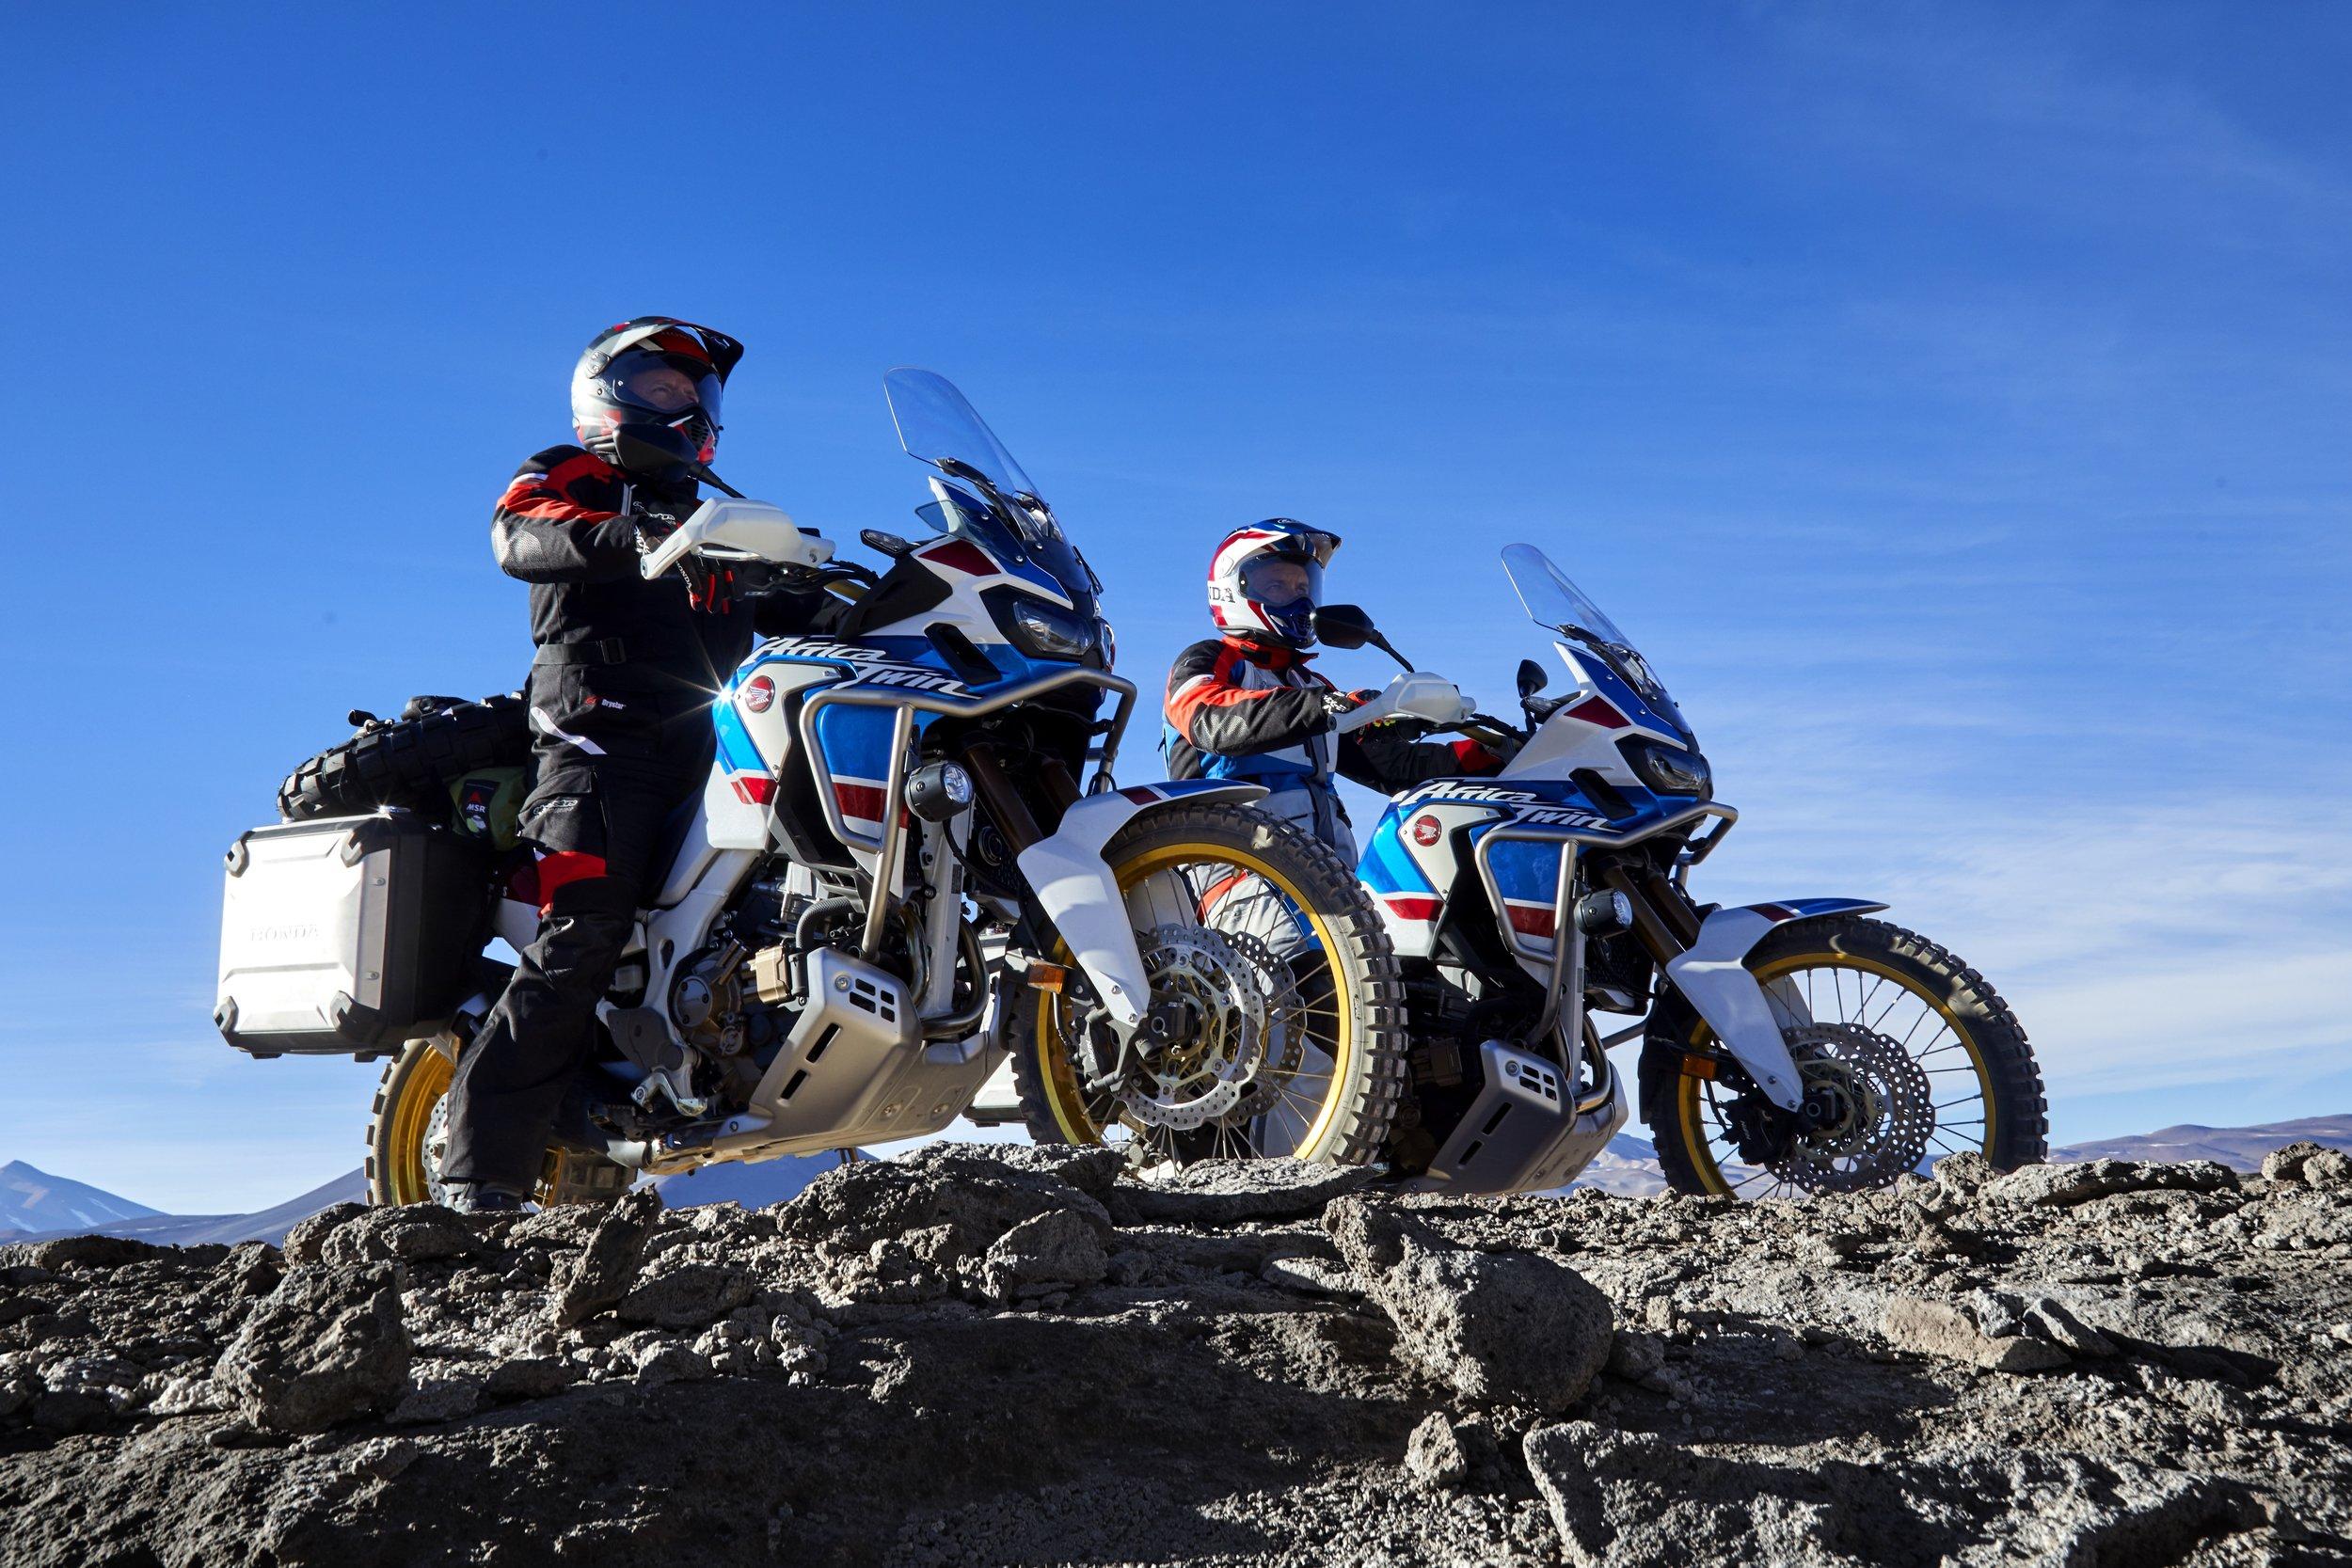 18_Honda_Africa_Twin_Adventure_Sports_Action_Image_7.jpg